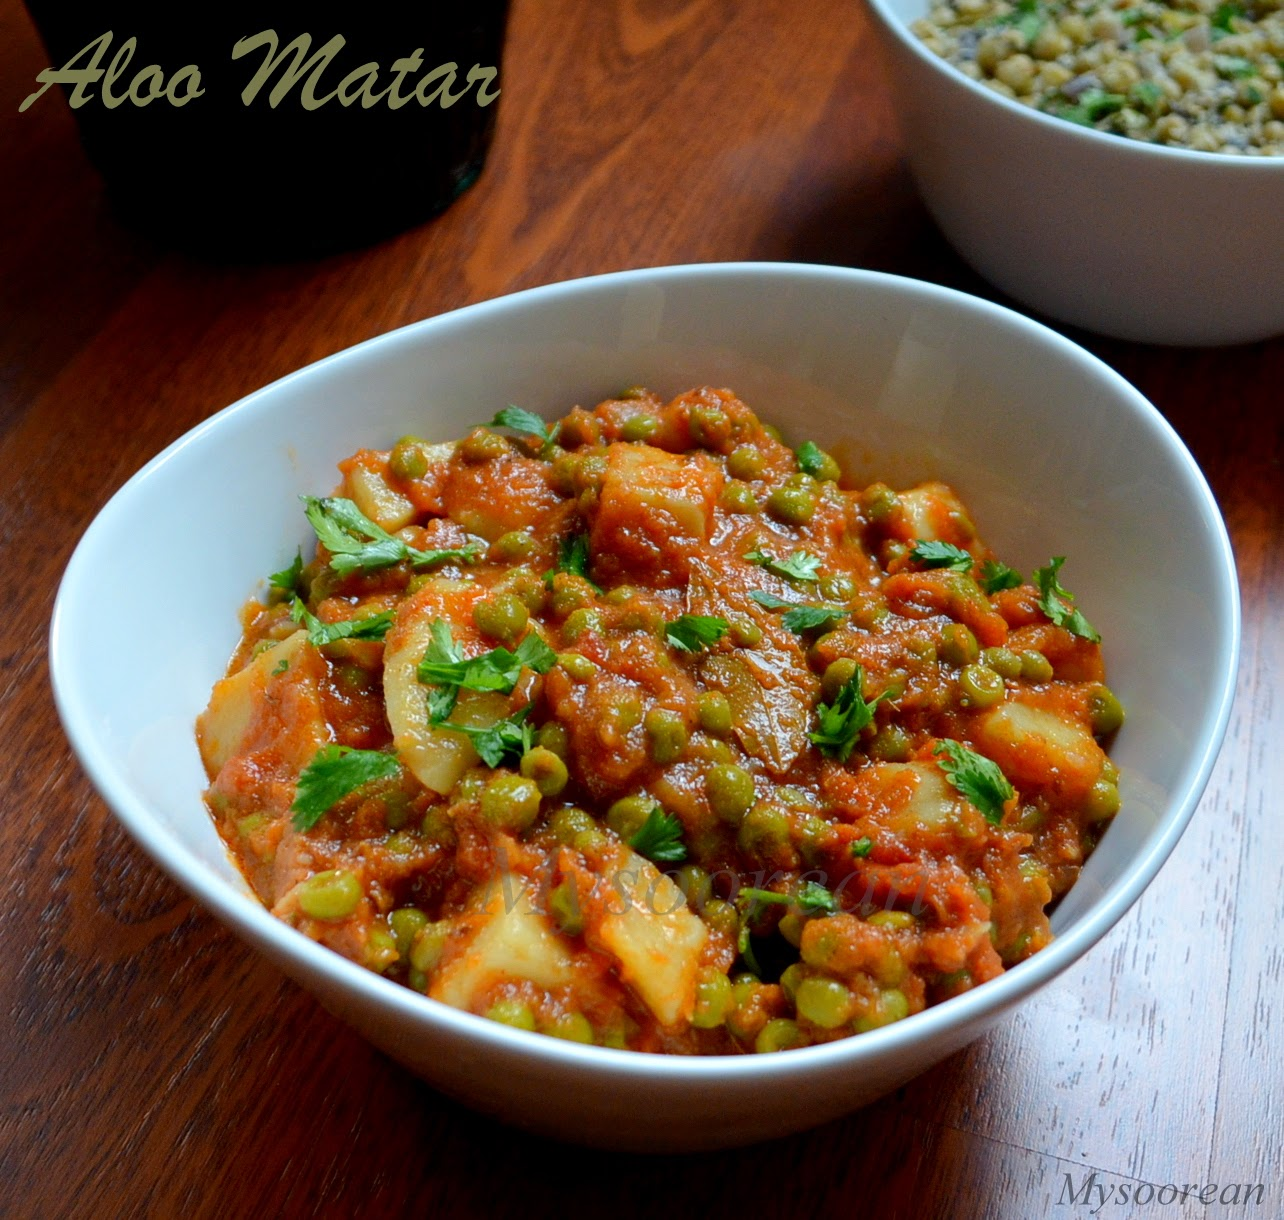 Aloo Matar - Peas and Potato Curry